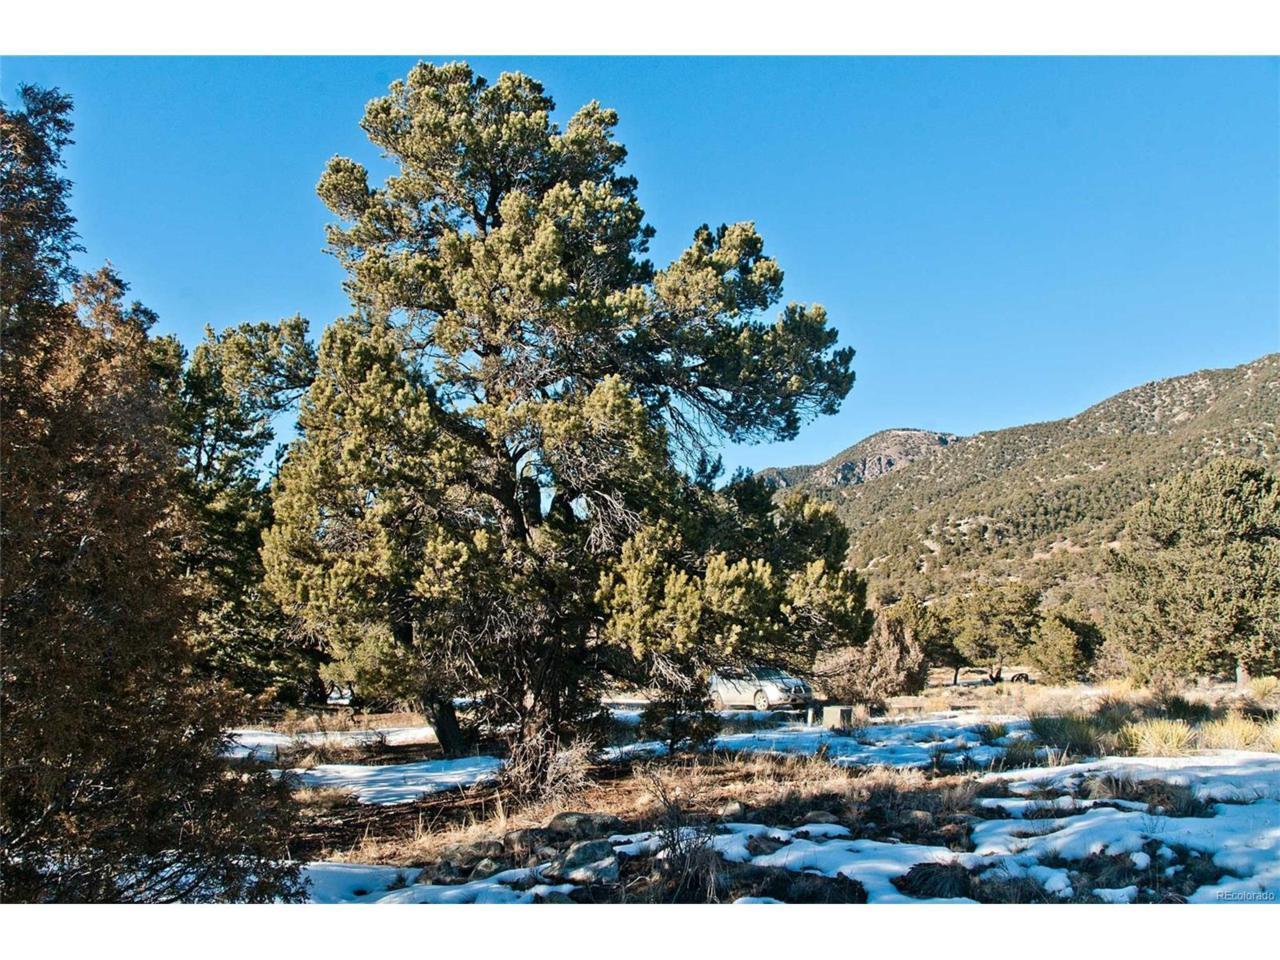 4272 Rambling Way, Crestone, CO 81131 (MLS #8683606) :: 8z Real Estate